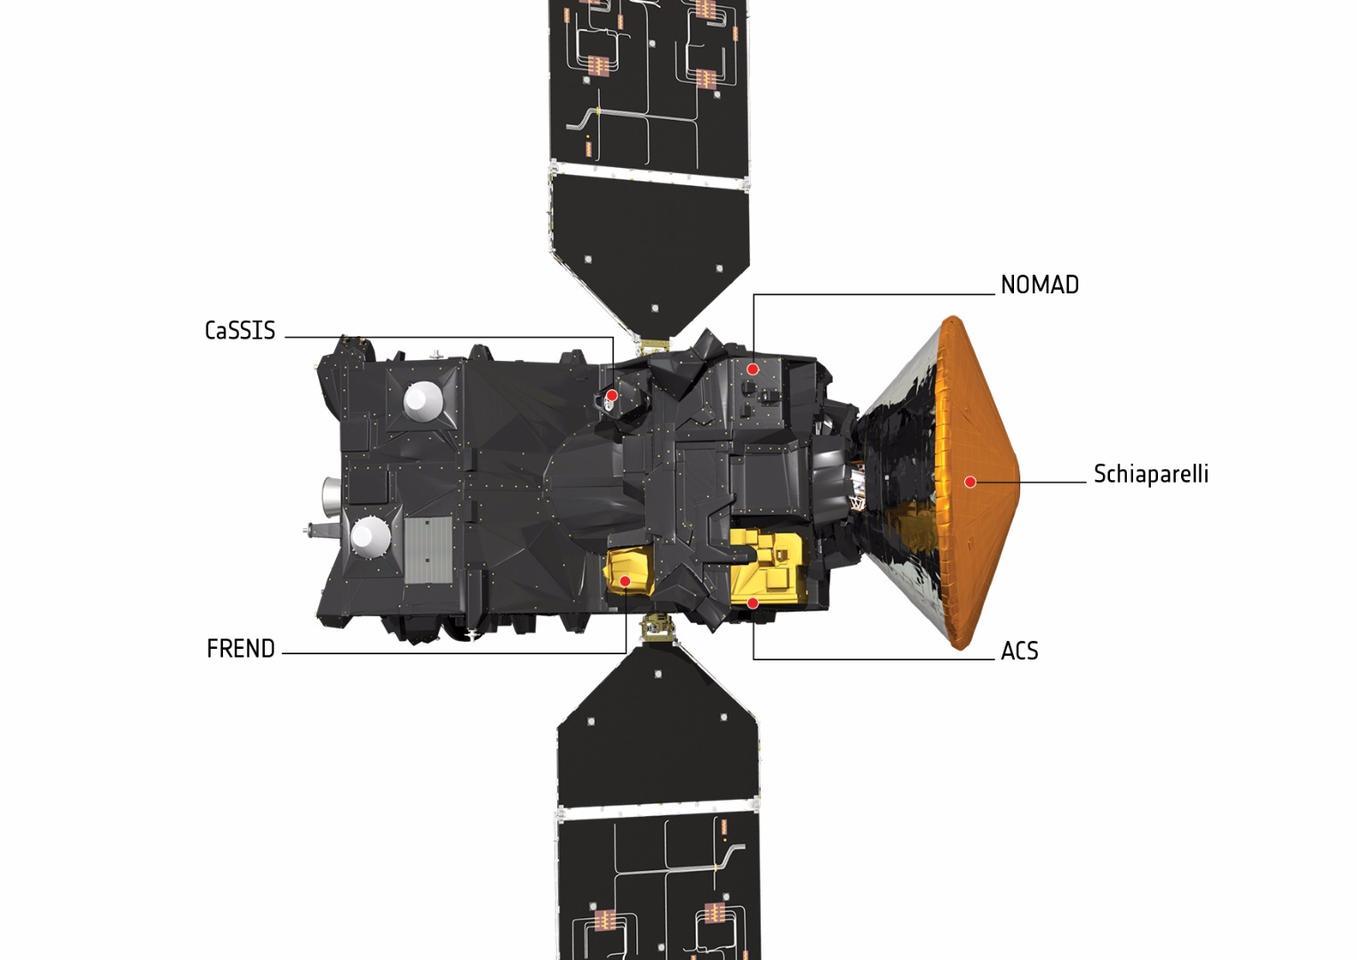 Diagram of the Trace Gas Orbiter and Schiaparelli,